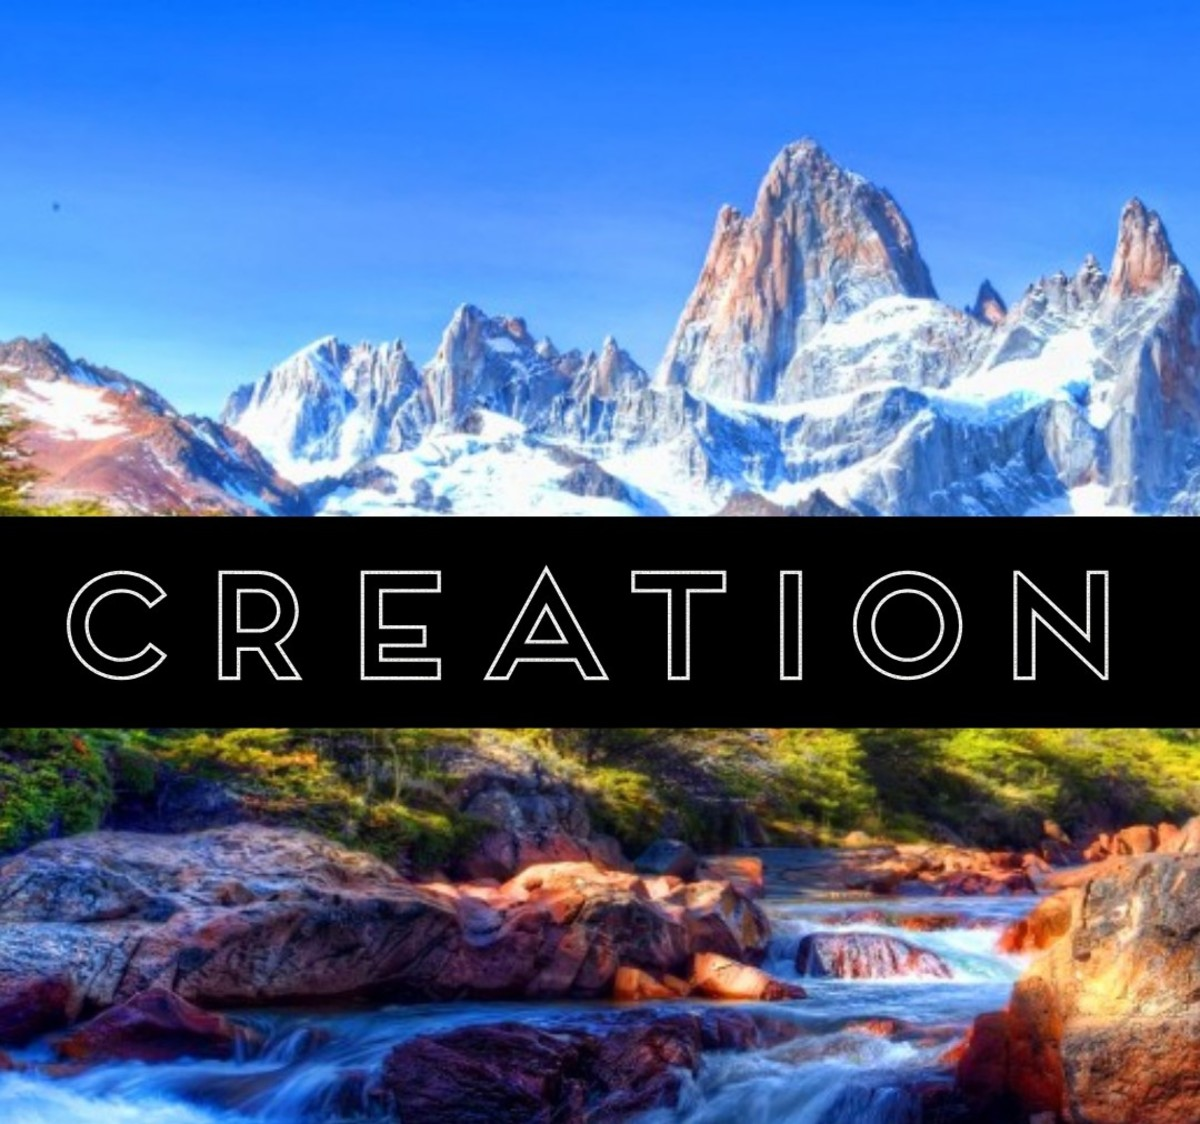 Creation (A Poem)